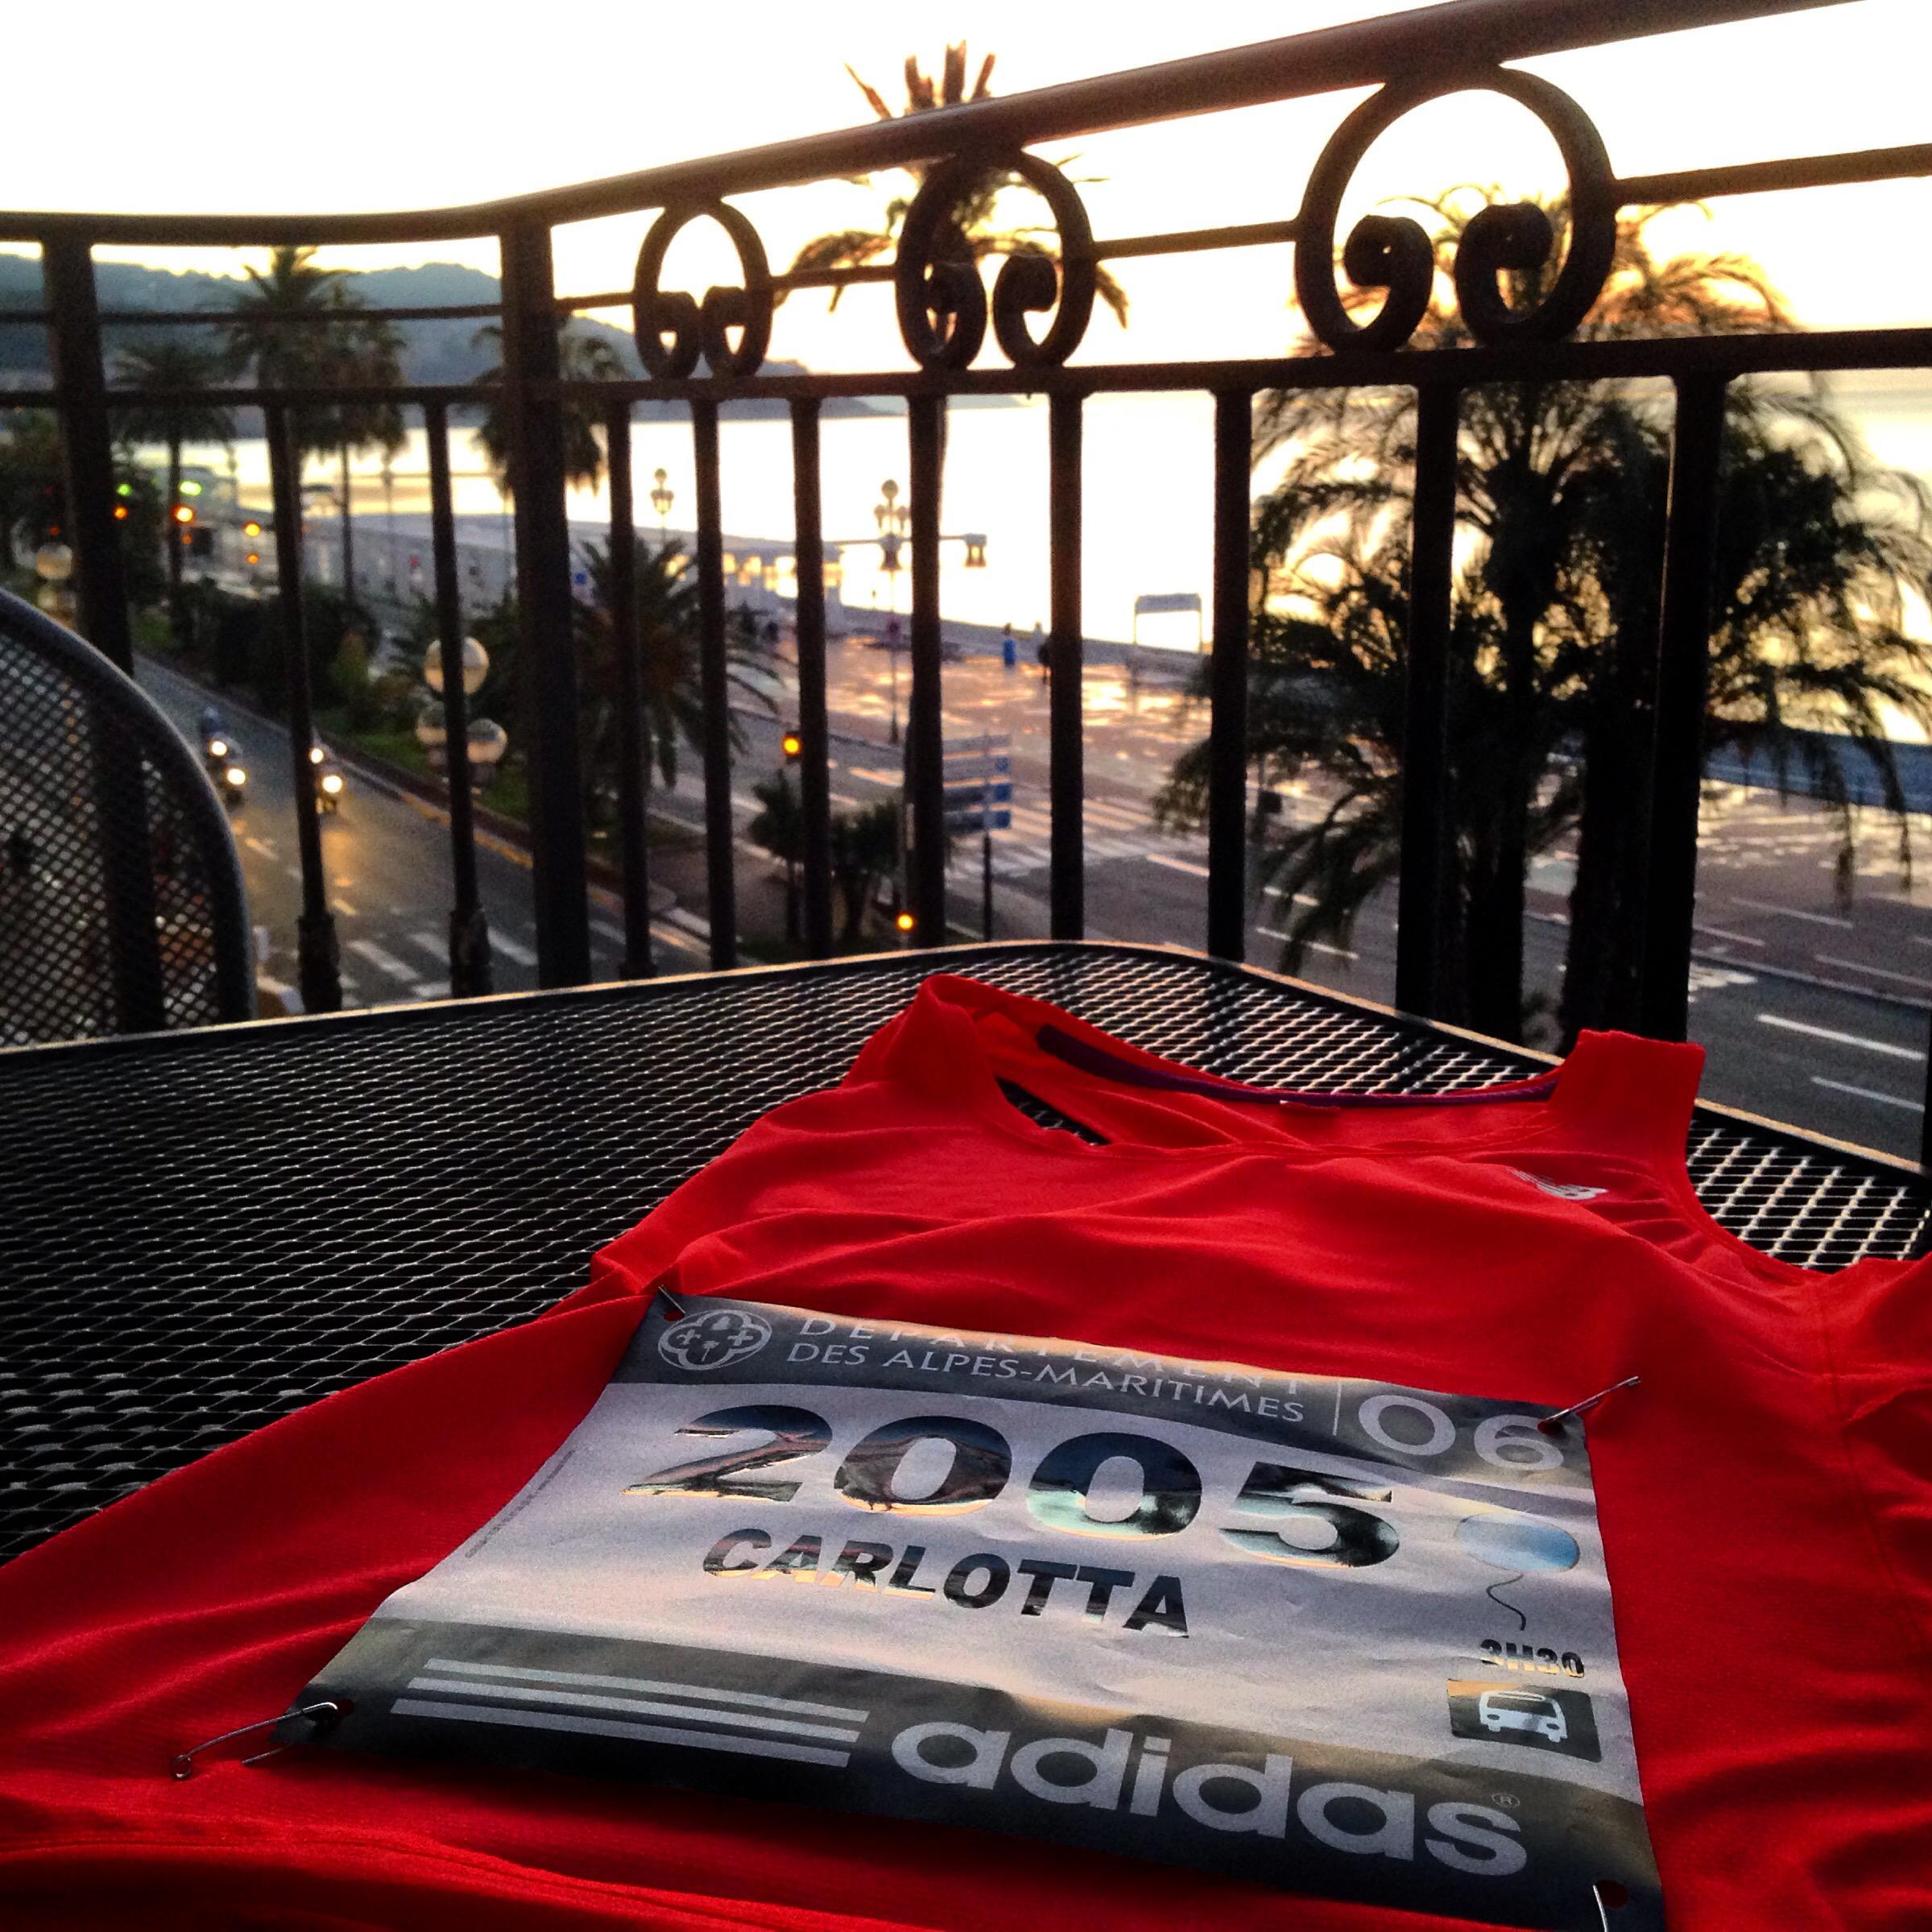 La Maratona della Vita: Marathon des Alpes Maritimes